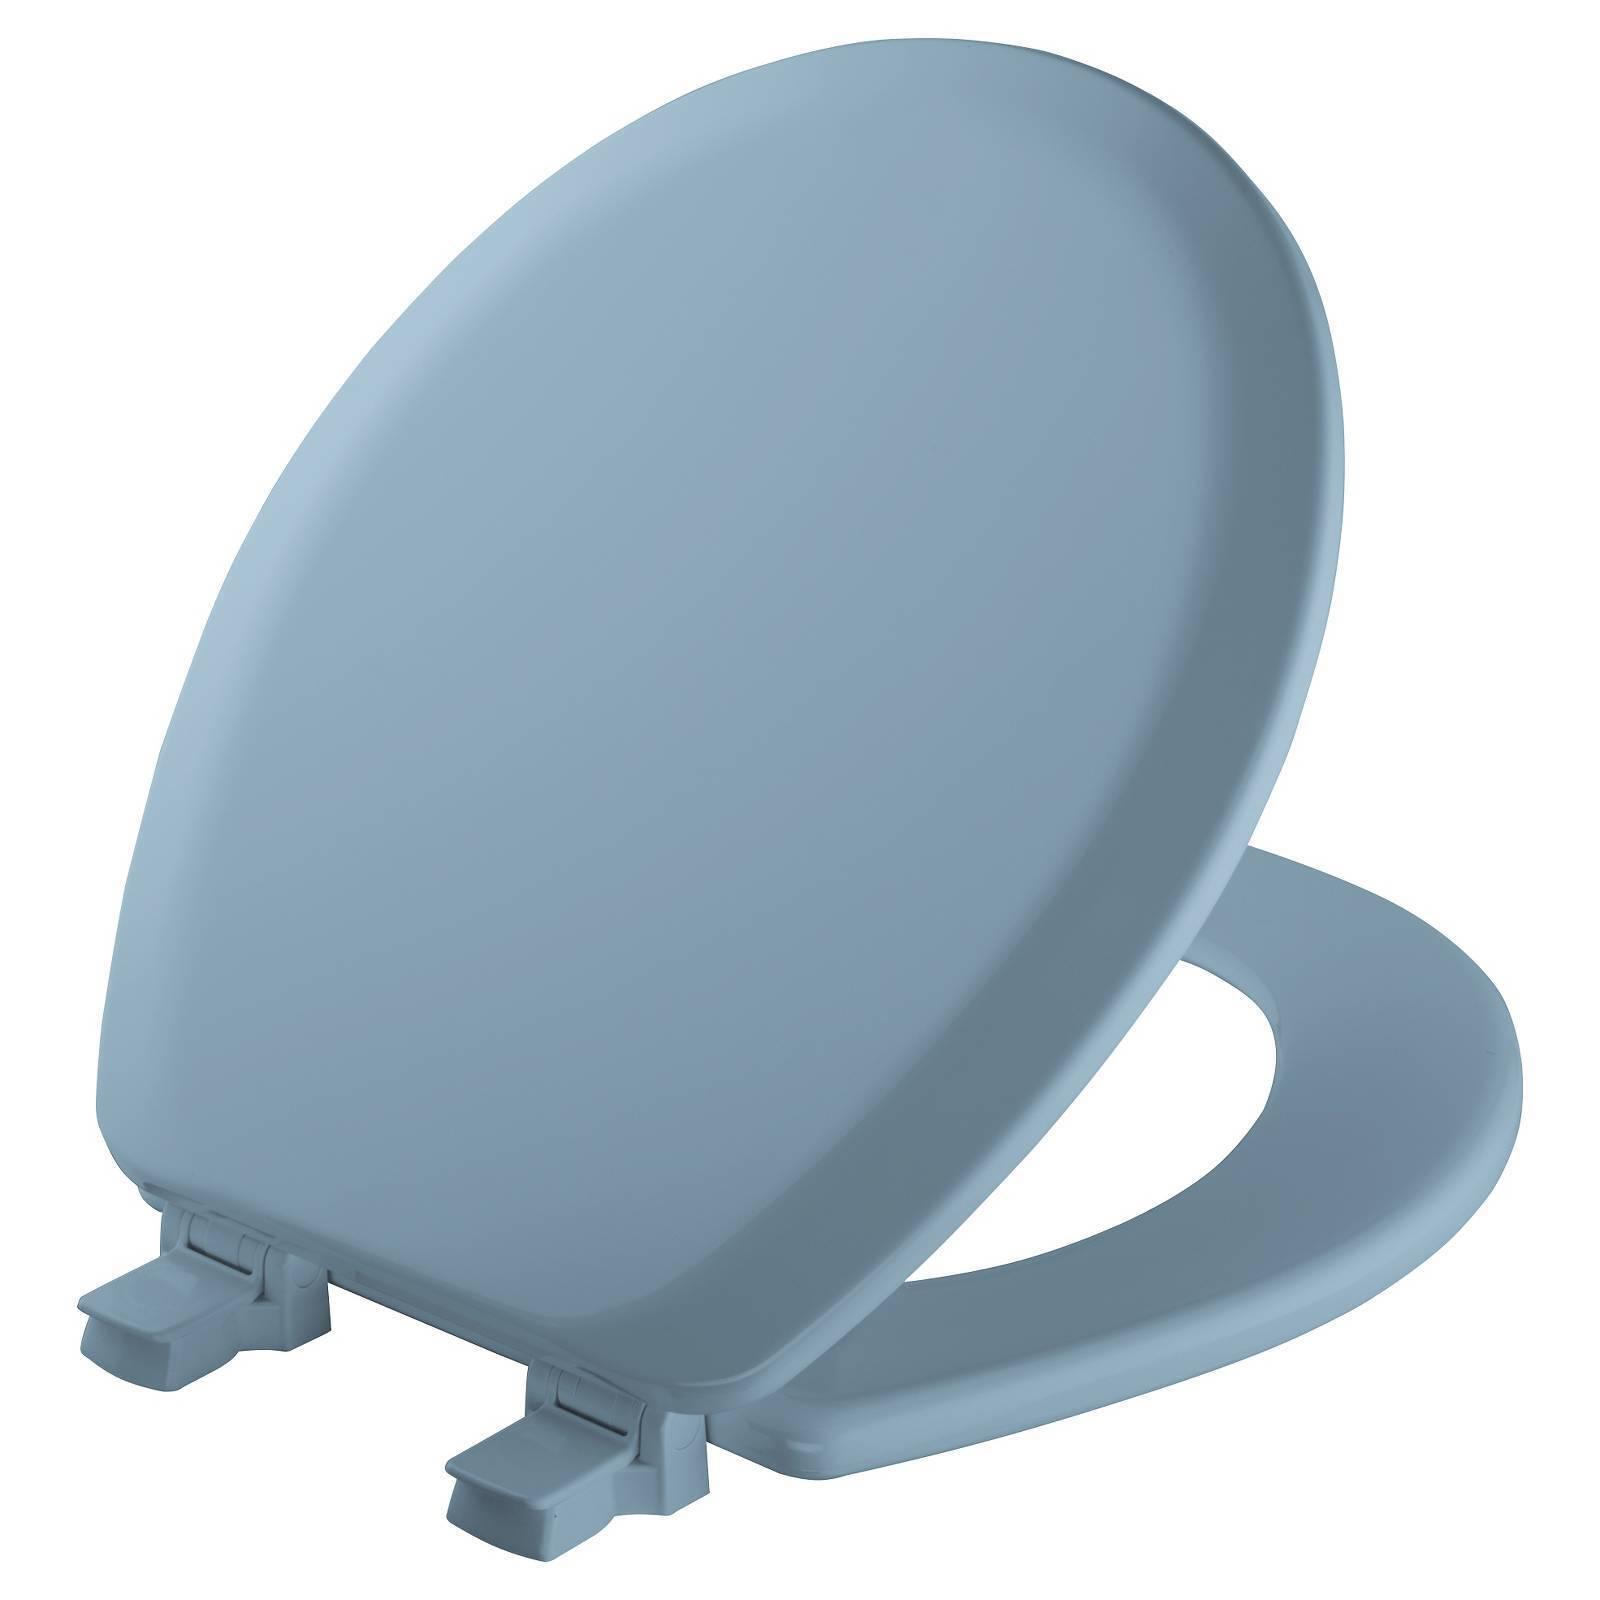 Bemis Toilet Seat Round Sky Blue Wood 41ec 034 | eBay